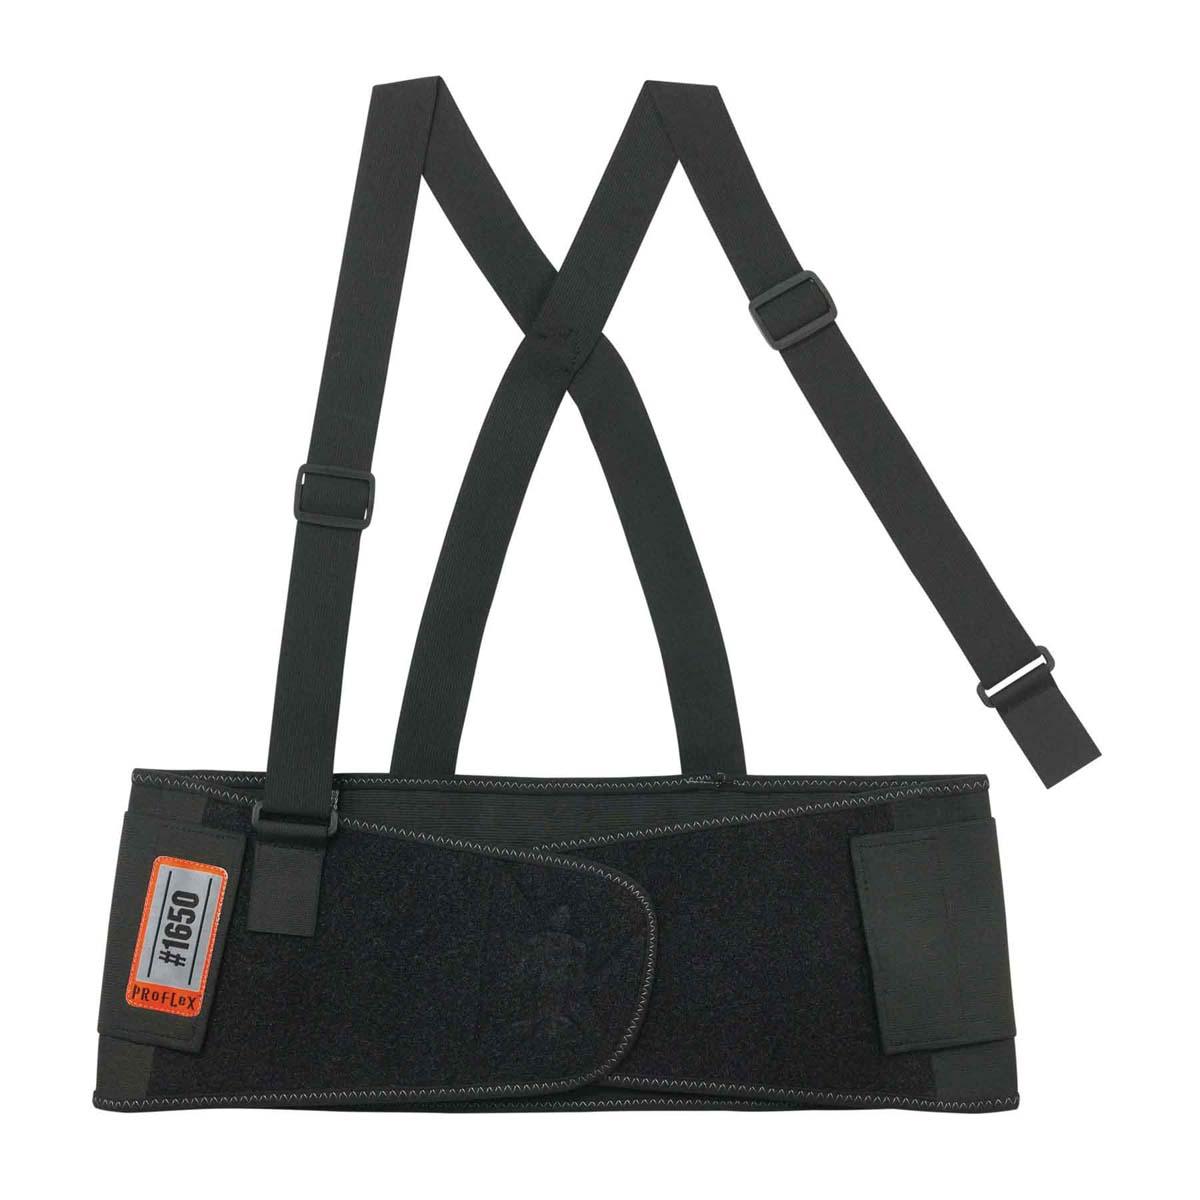 1650 3XL Black Economy Elastic Back Support